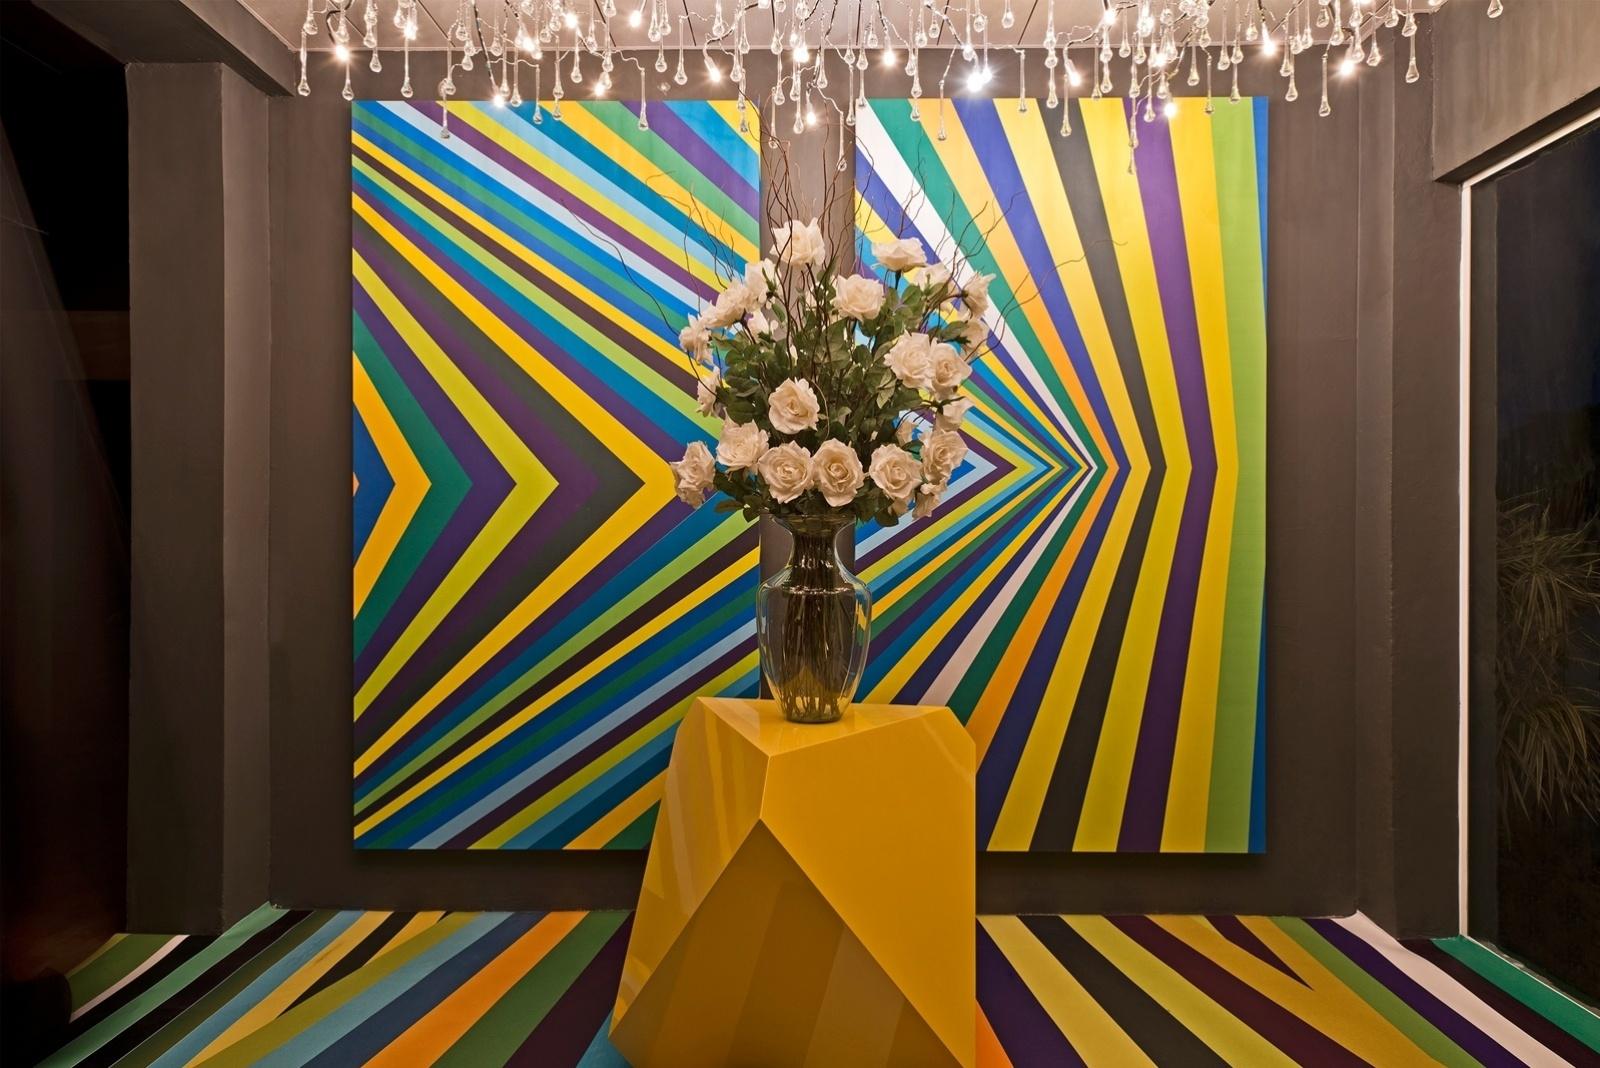 Morar Mais Curitiba - 2012: Hall de Entrada-Gleidson Silvério e Milena Kovalczuk